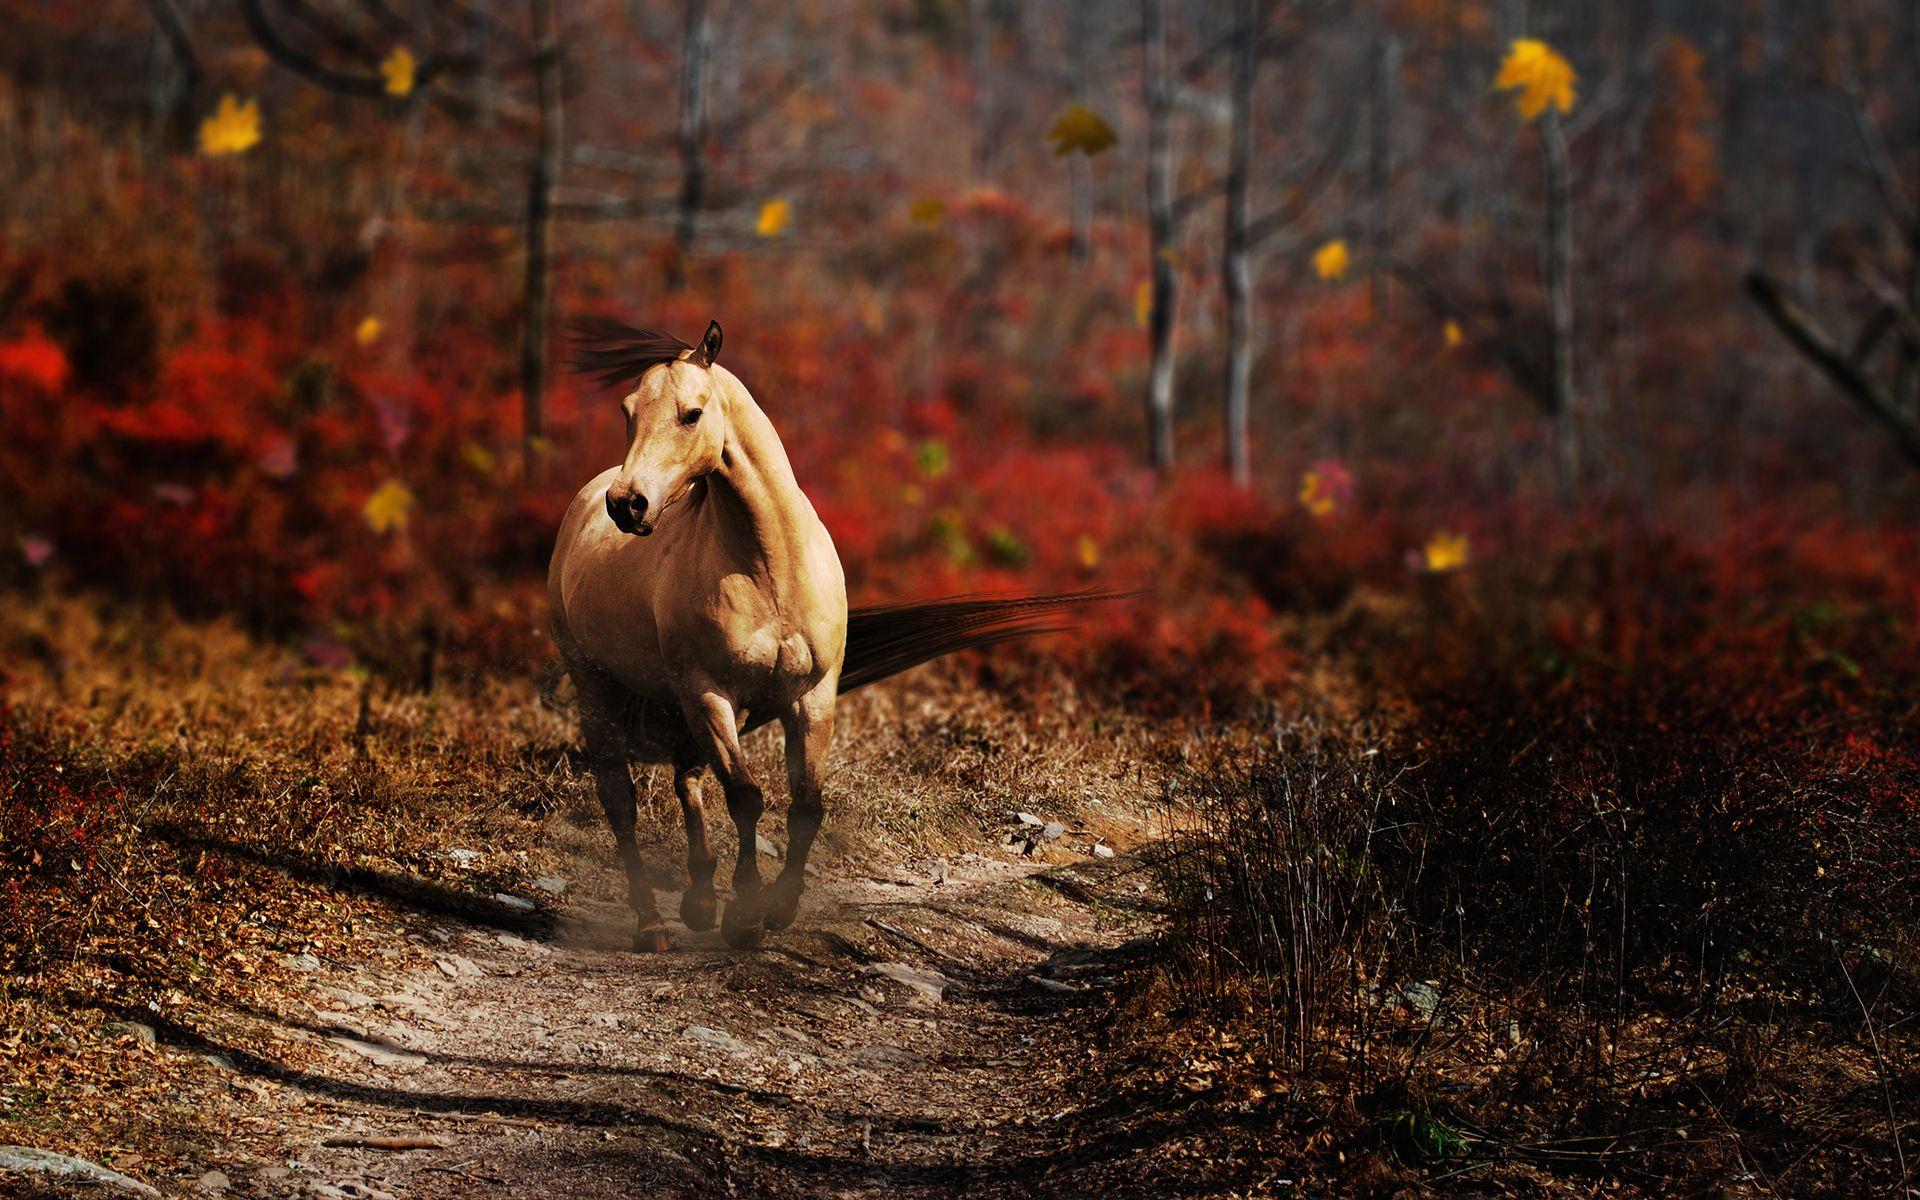 Simple Wallpaper Horse Photography - eb8139d5f1d23e03048989d4bf44026e  Photograph_152118.jpg